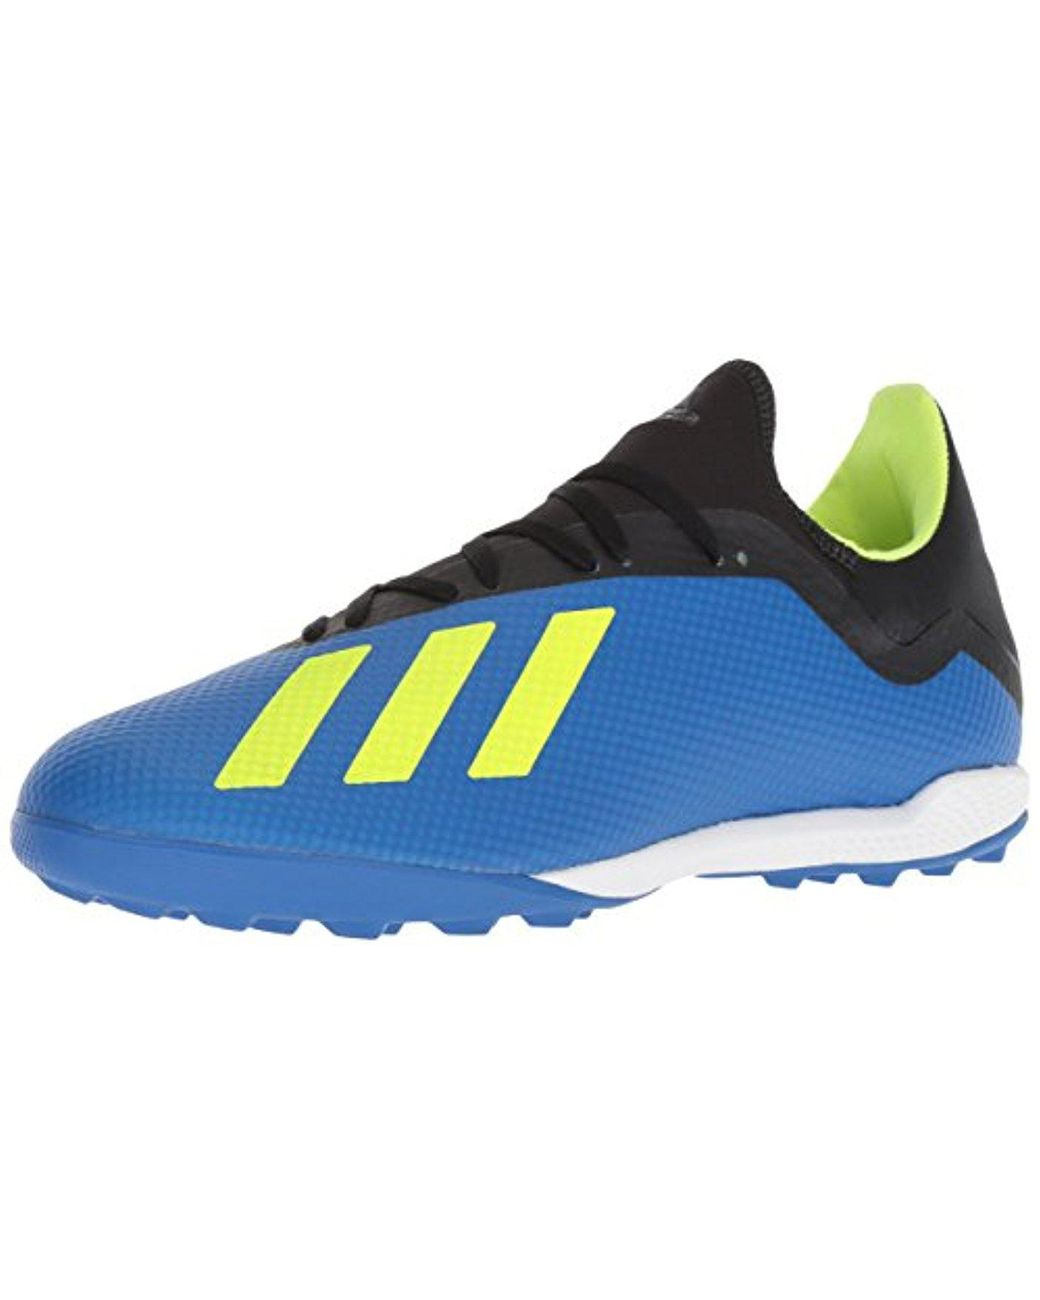 new product a04b5 19cdc Men's Blue X Tango 18.3 Turf Soccer Shoe